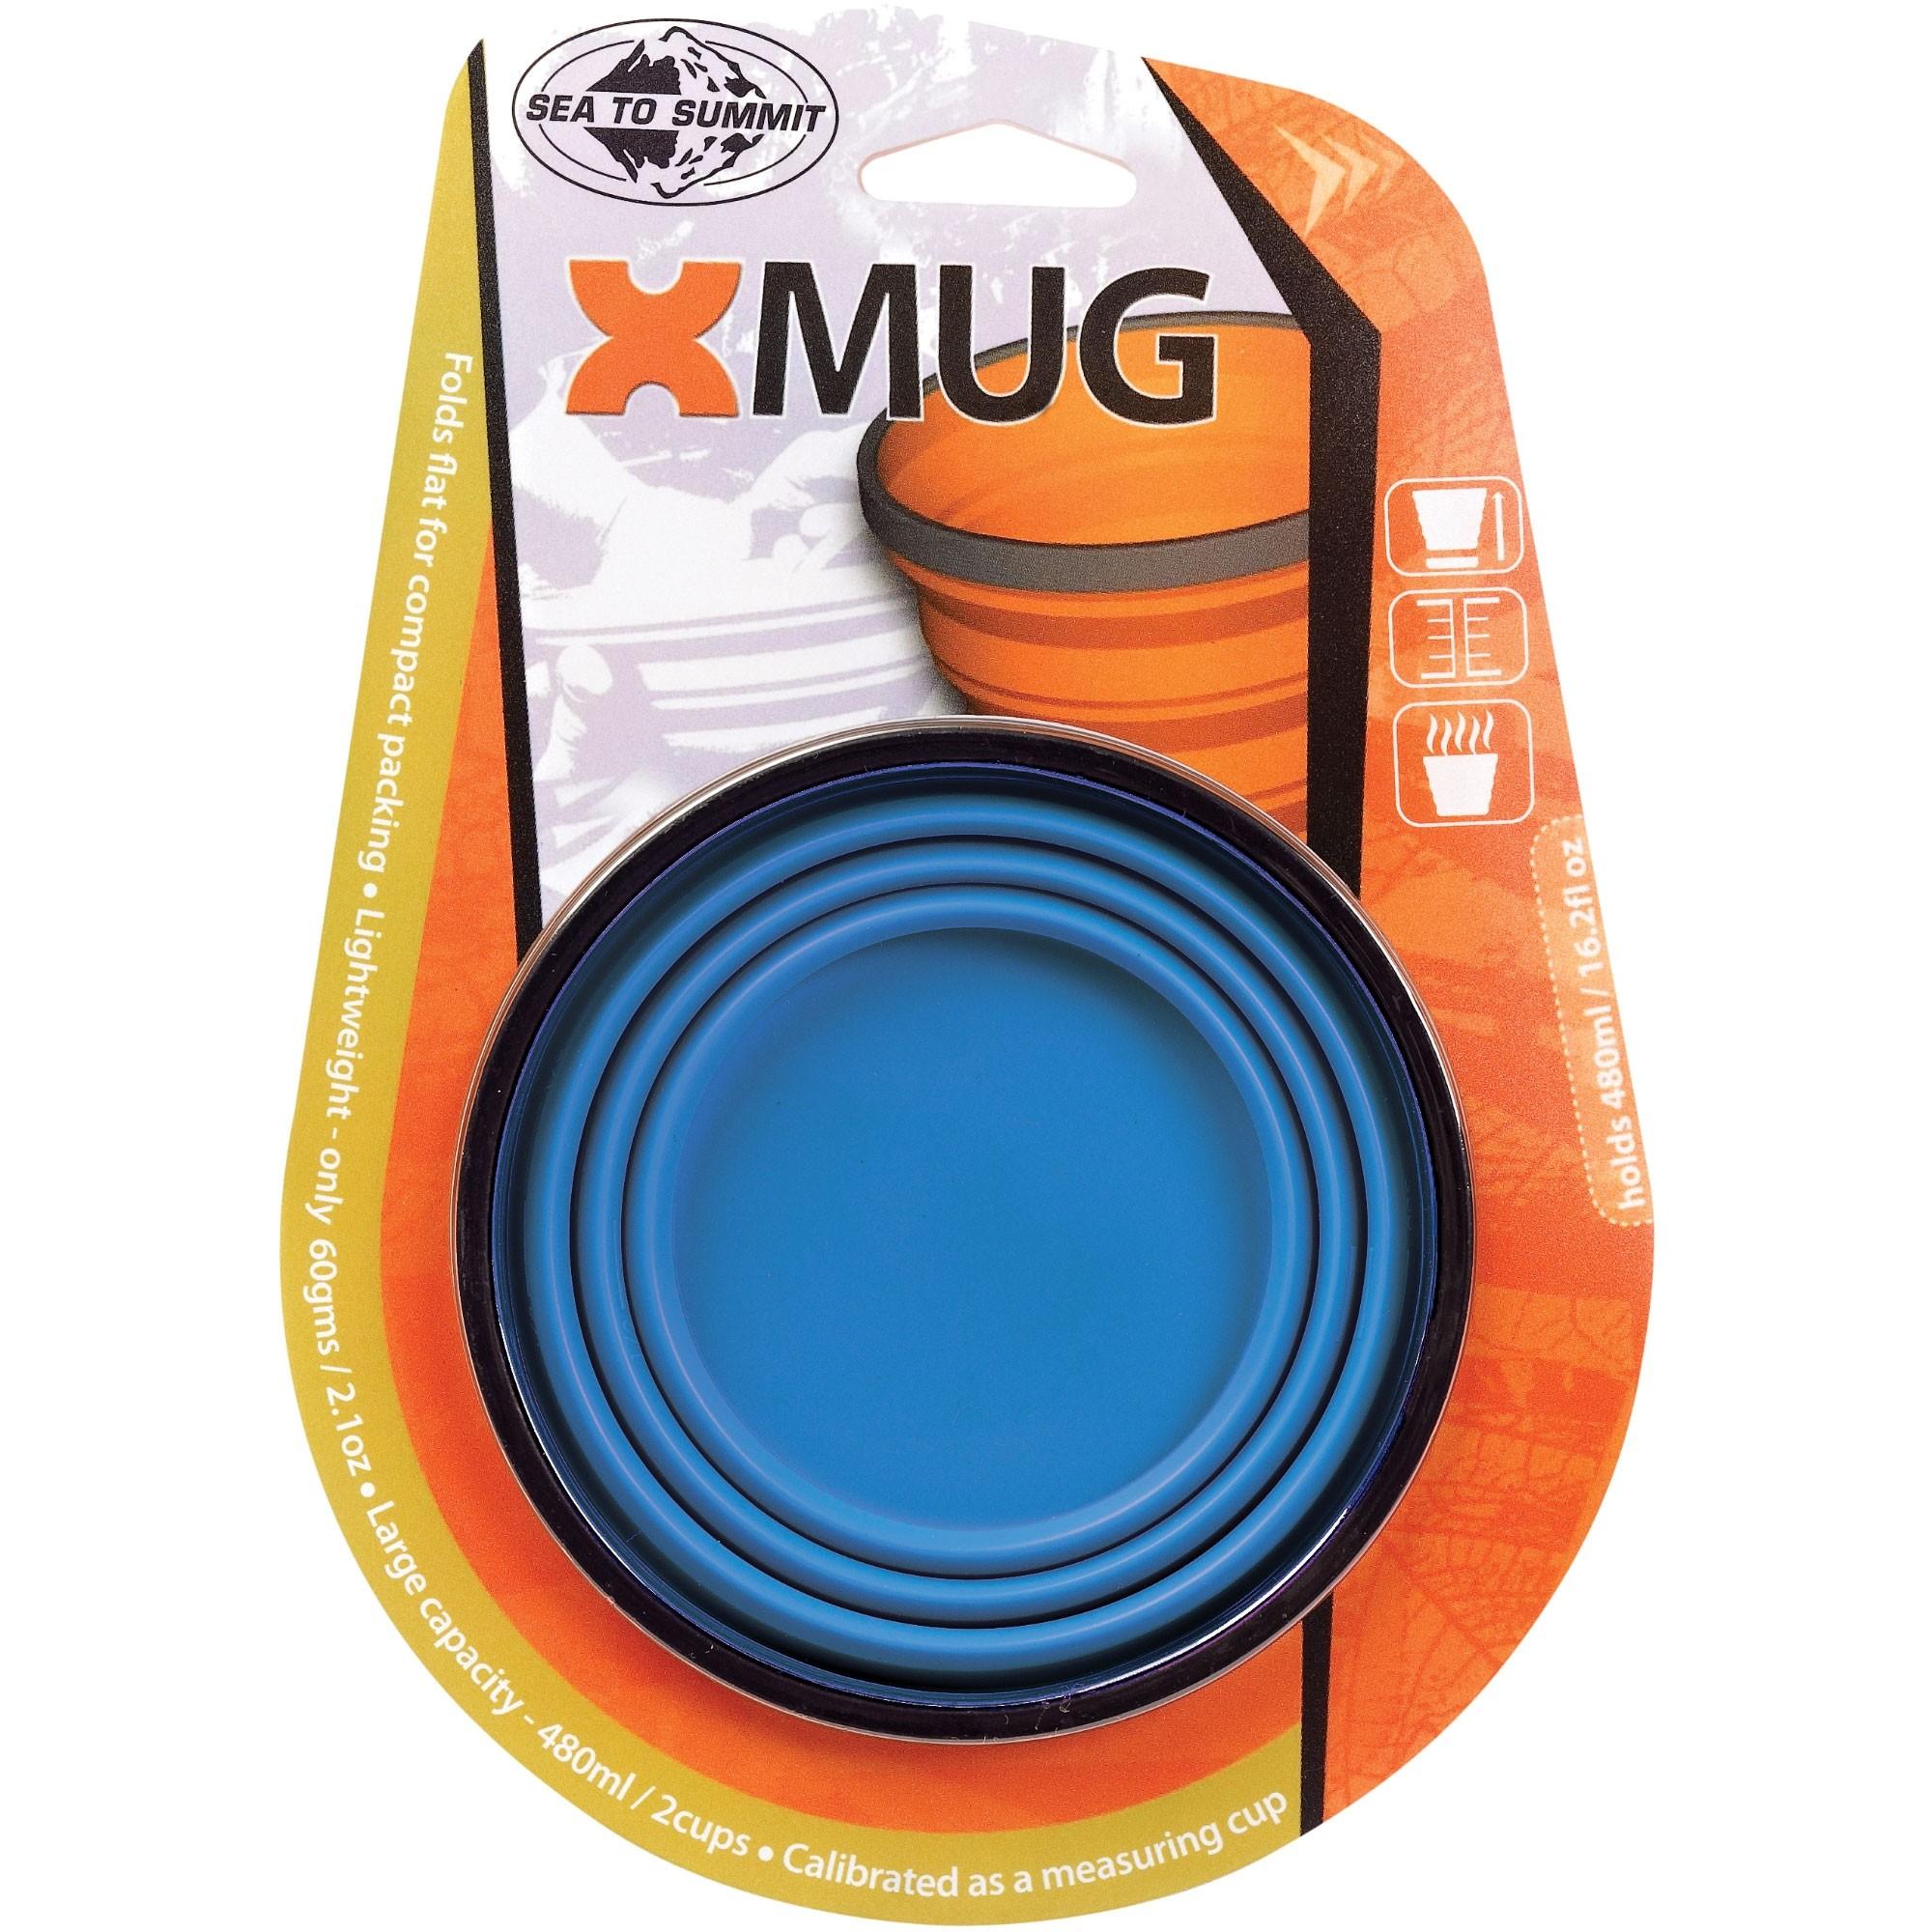 Sea to Summit X-Mug - Blue